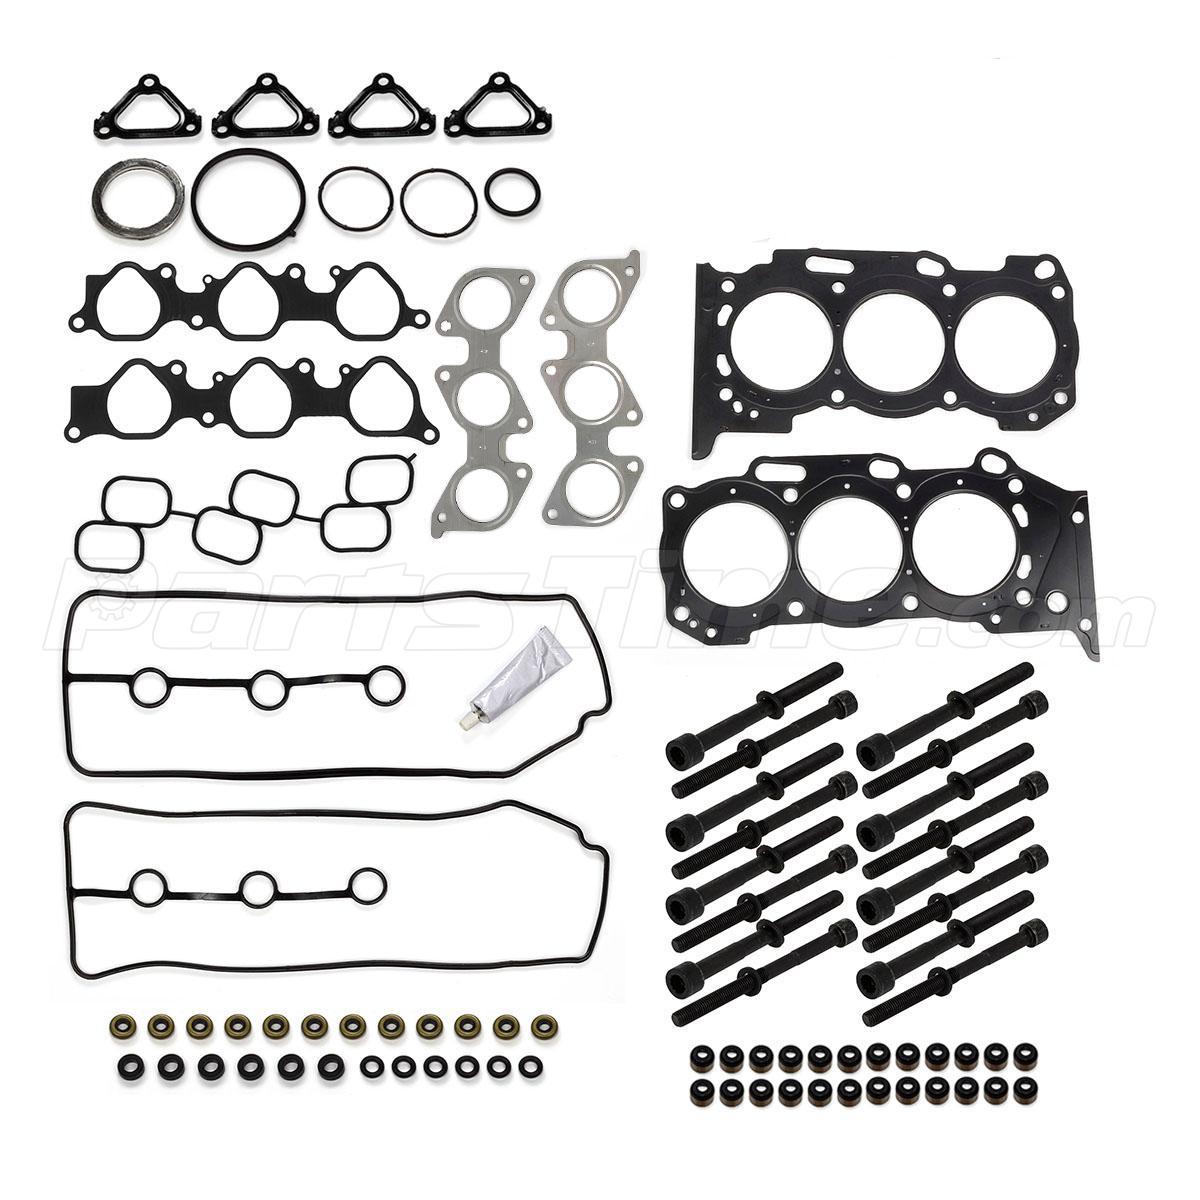 Saab 900 engine diagram likewise chrysler 300m heater control valve location additionally saab 9 5 serpentine